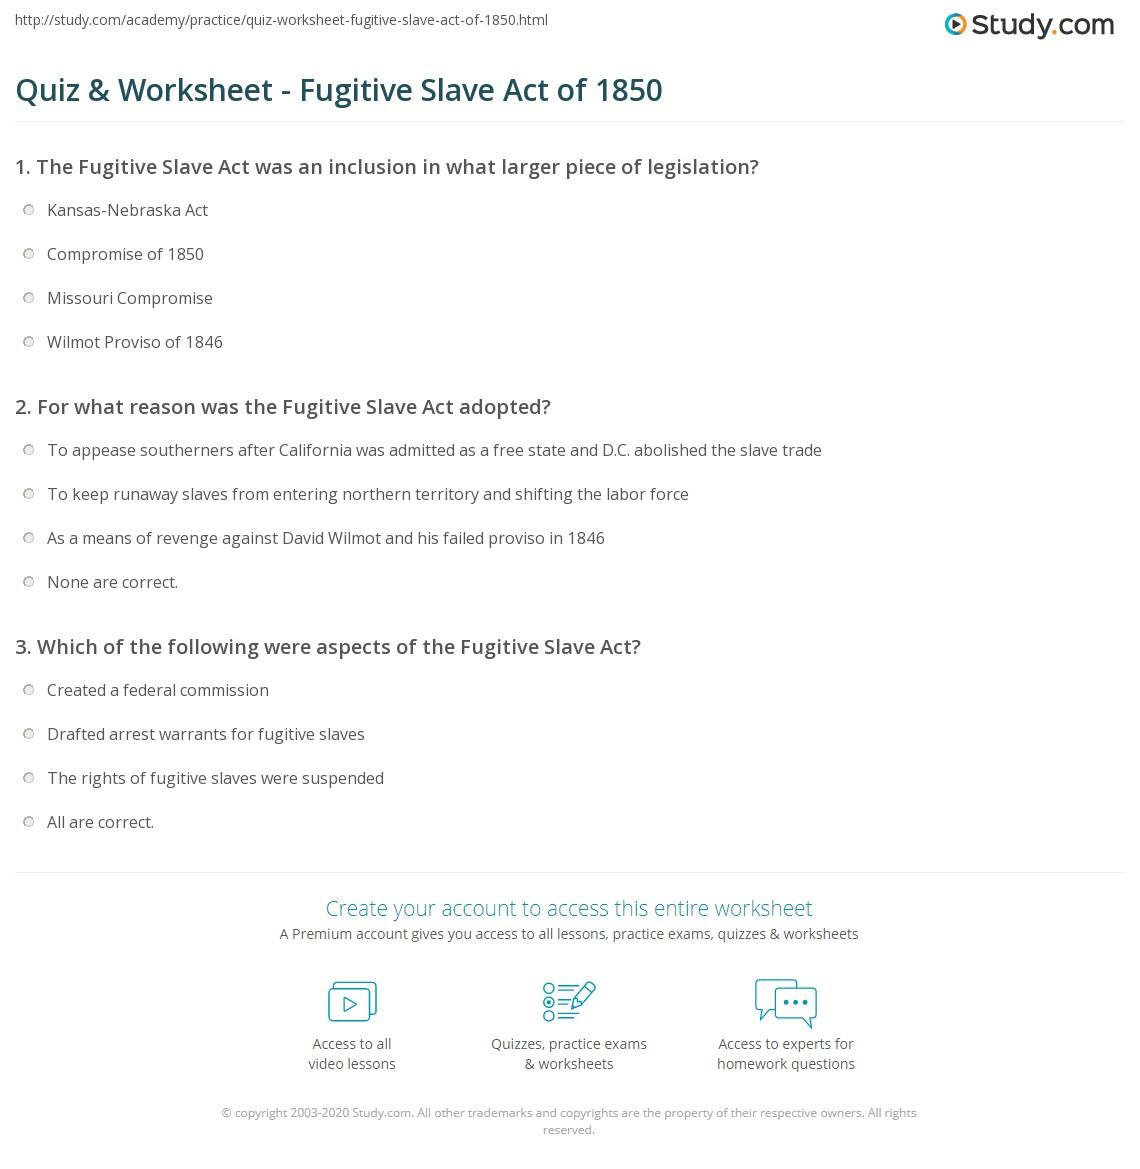 Quiz Worksheet Fugitive Slave Act Of 1850 Study Com